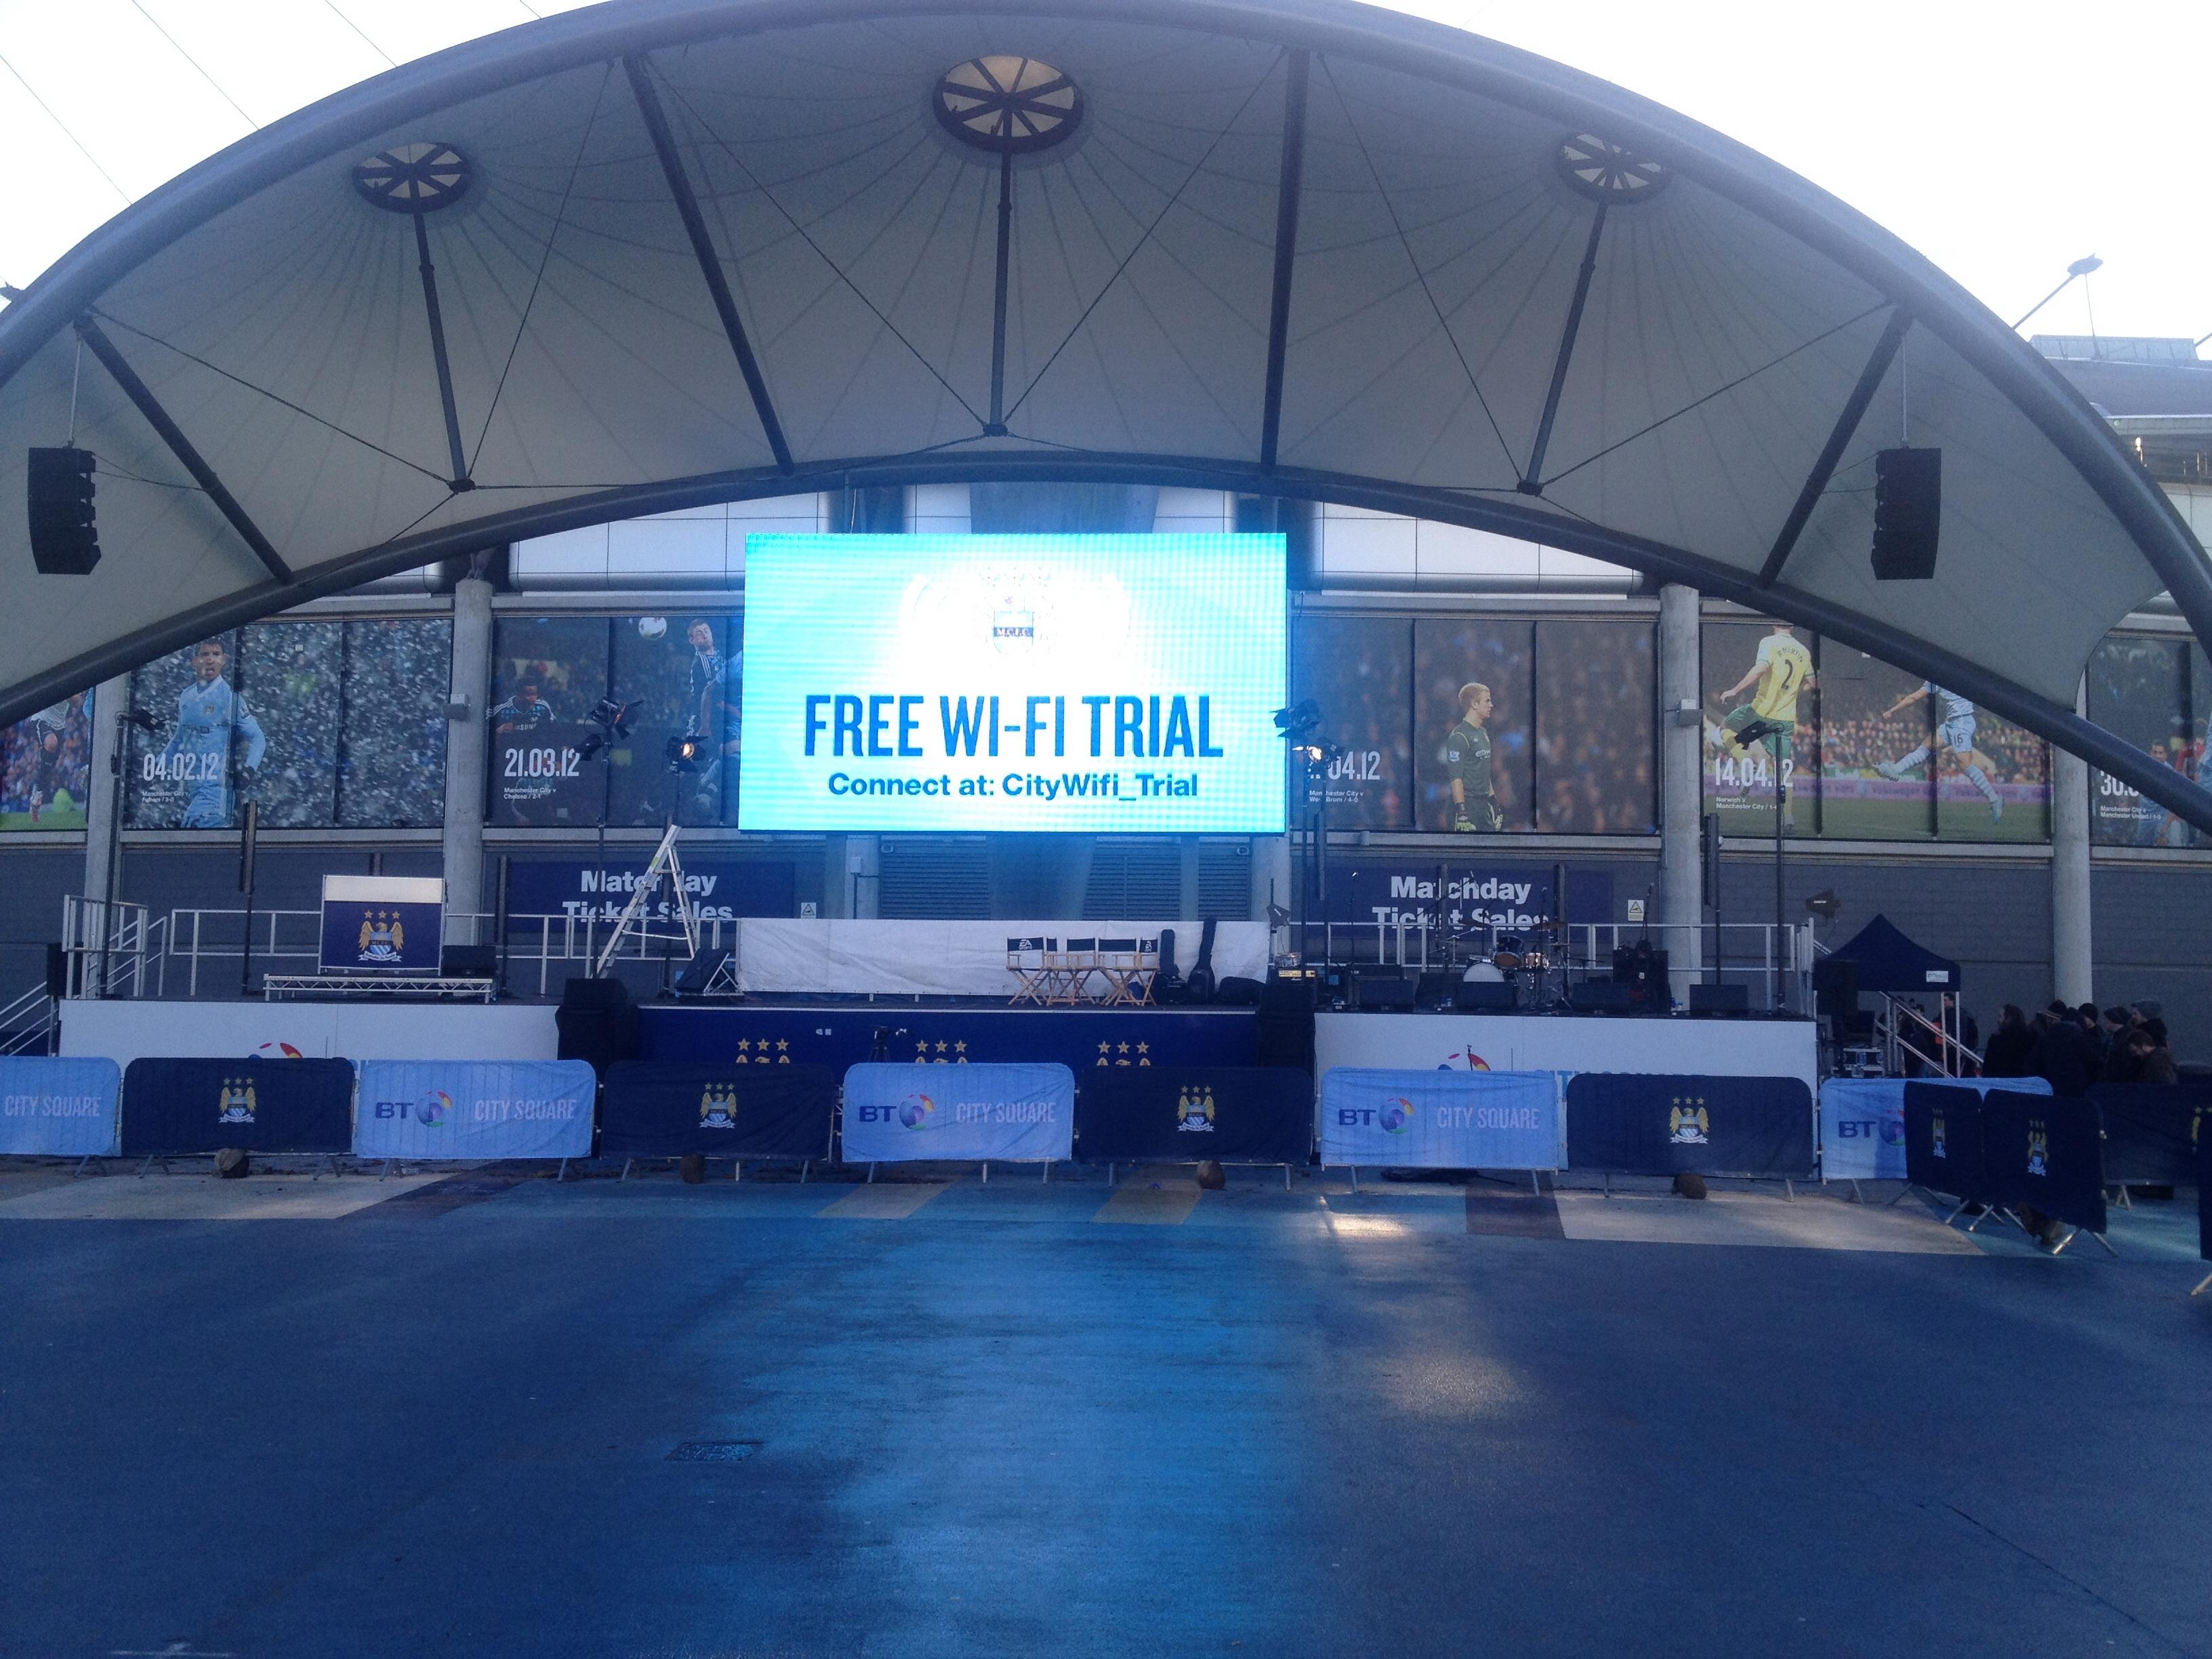 Free Wi-Fi at Etihad Stadium